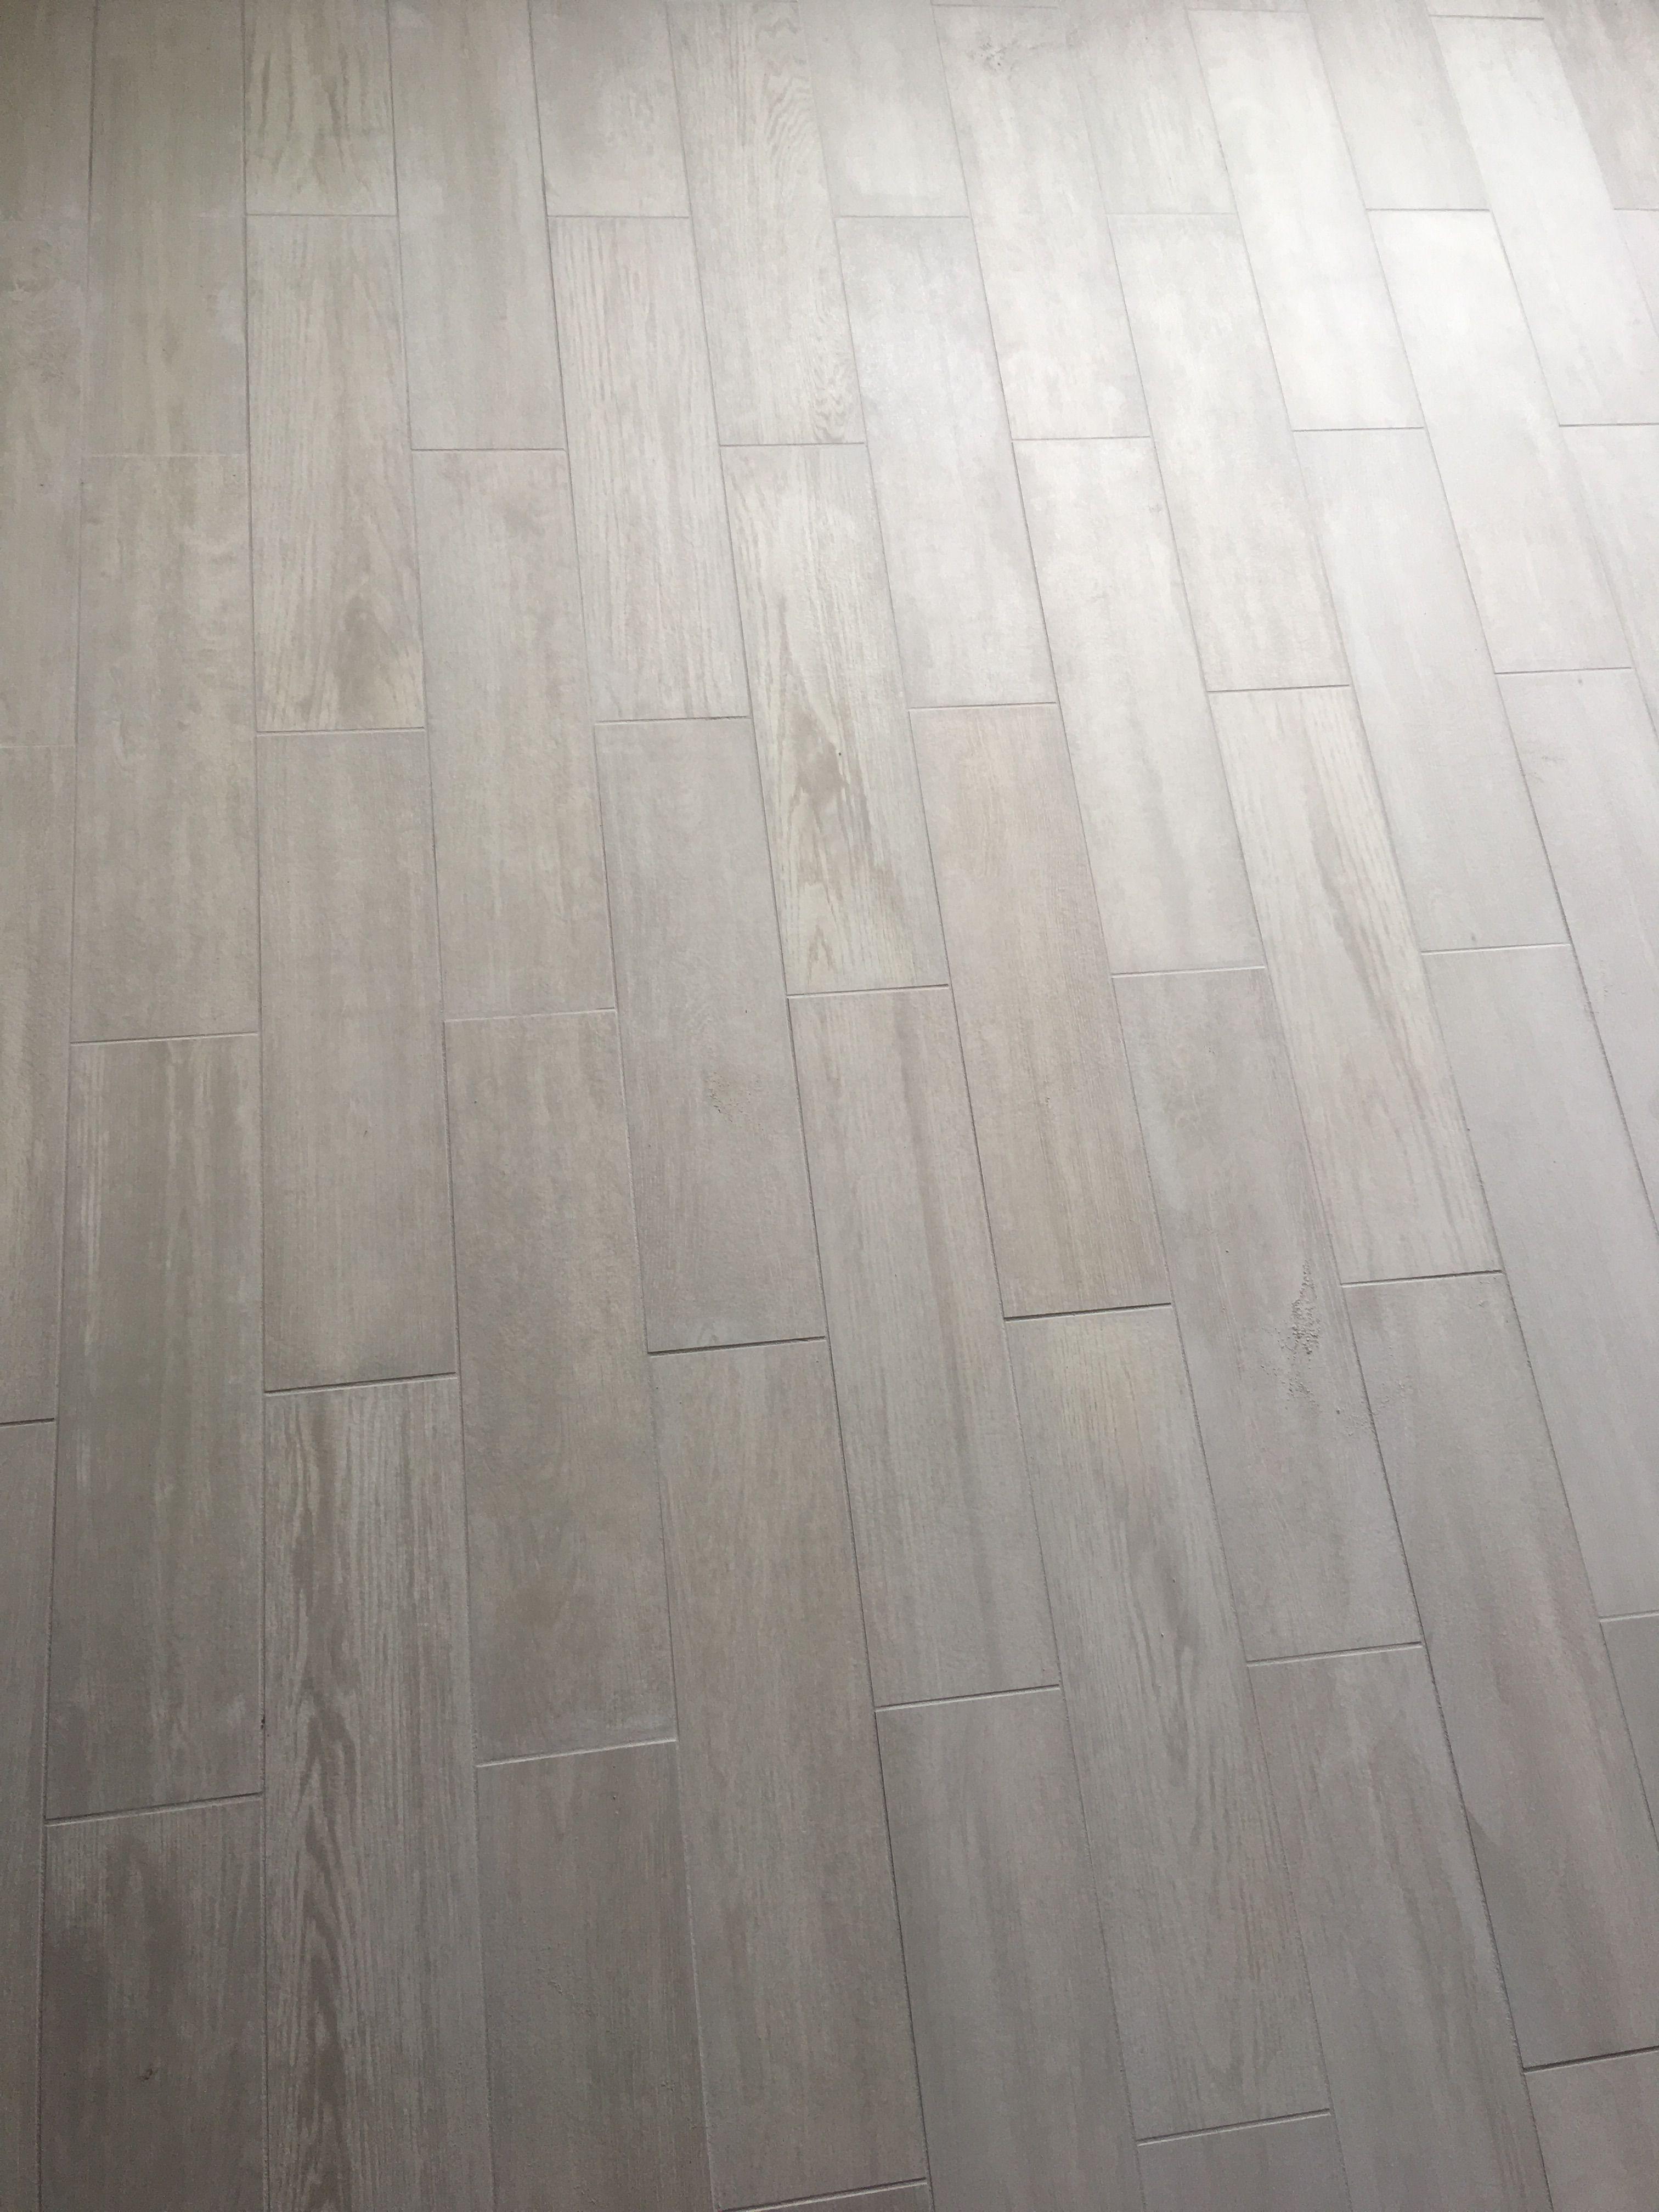 Lowes eldon white wood look porcelain tile with silver grout from lowes eldon white wood look porcelain tile with silver grout from menards dailygadgetfo Images